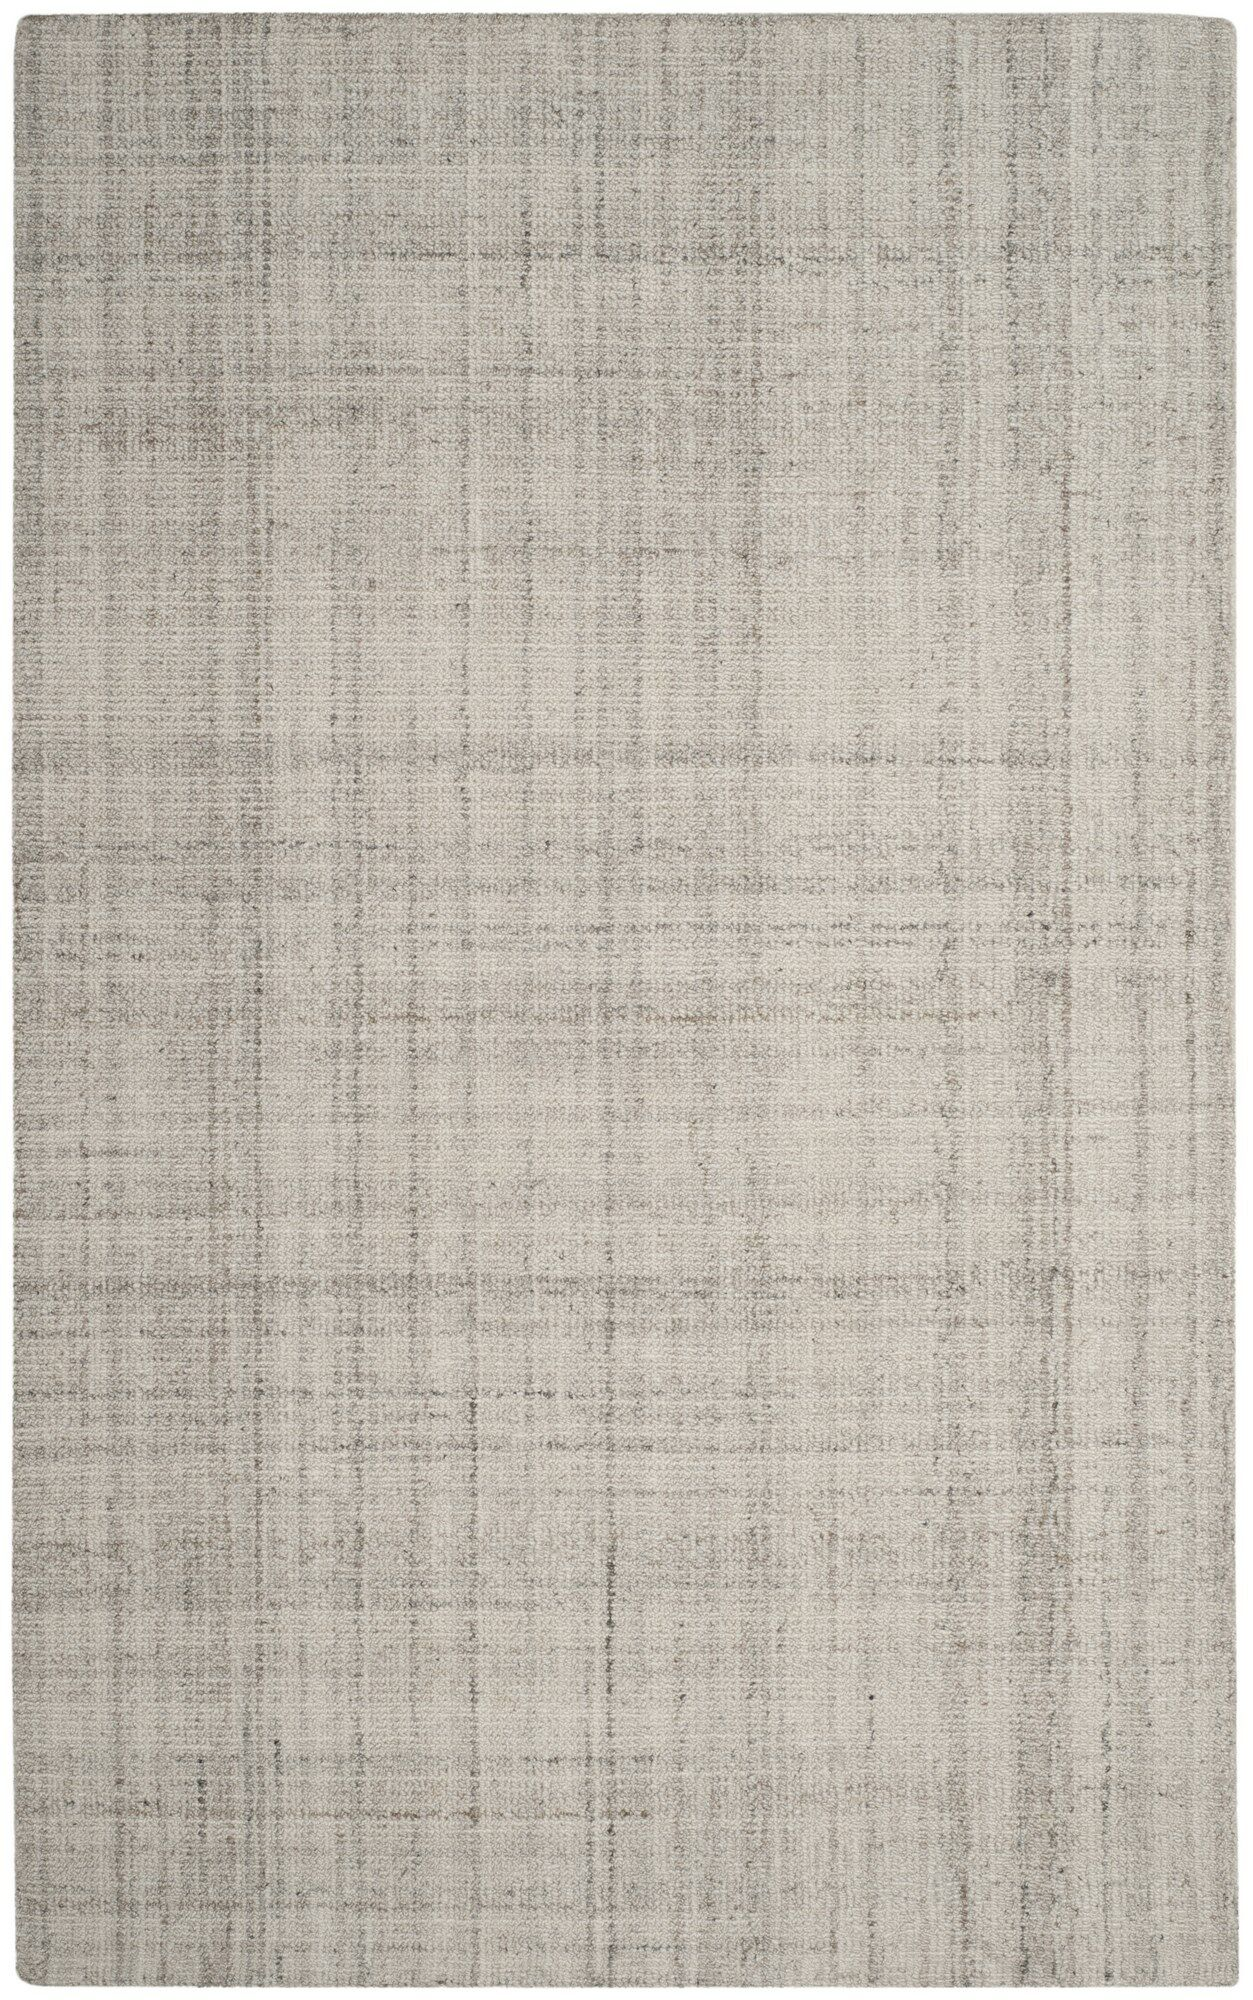 Drennon Hand-Tufted Light Gray Area Rug Rug Size: Rectangle 3' x 5'